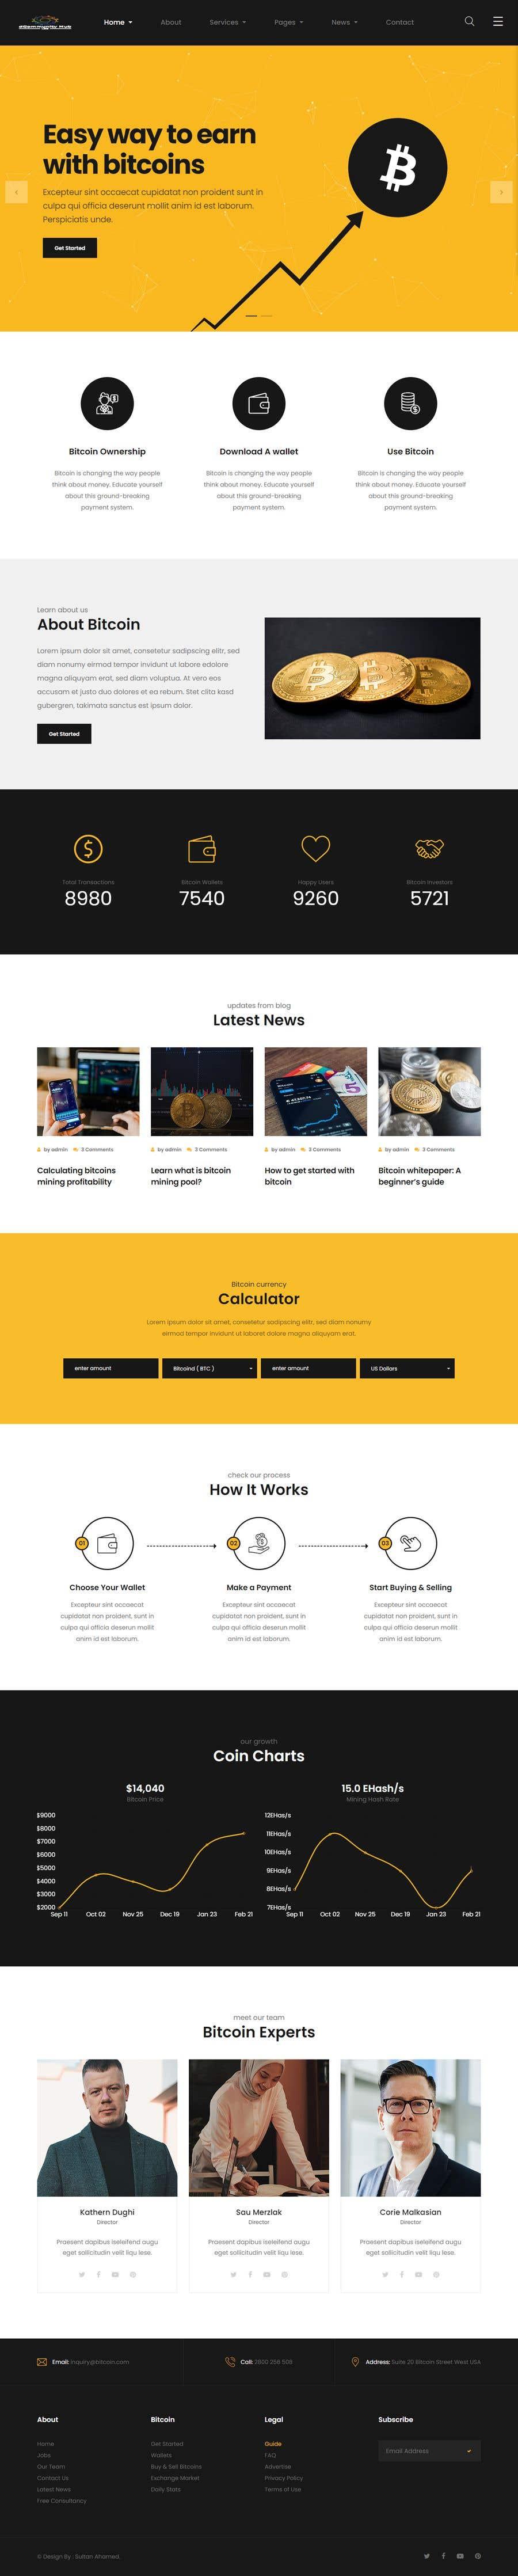 Penyertaan Peraduan #                                        11                                      untuk                                         Contest – Crypto Information Website Section: $100